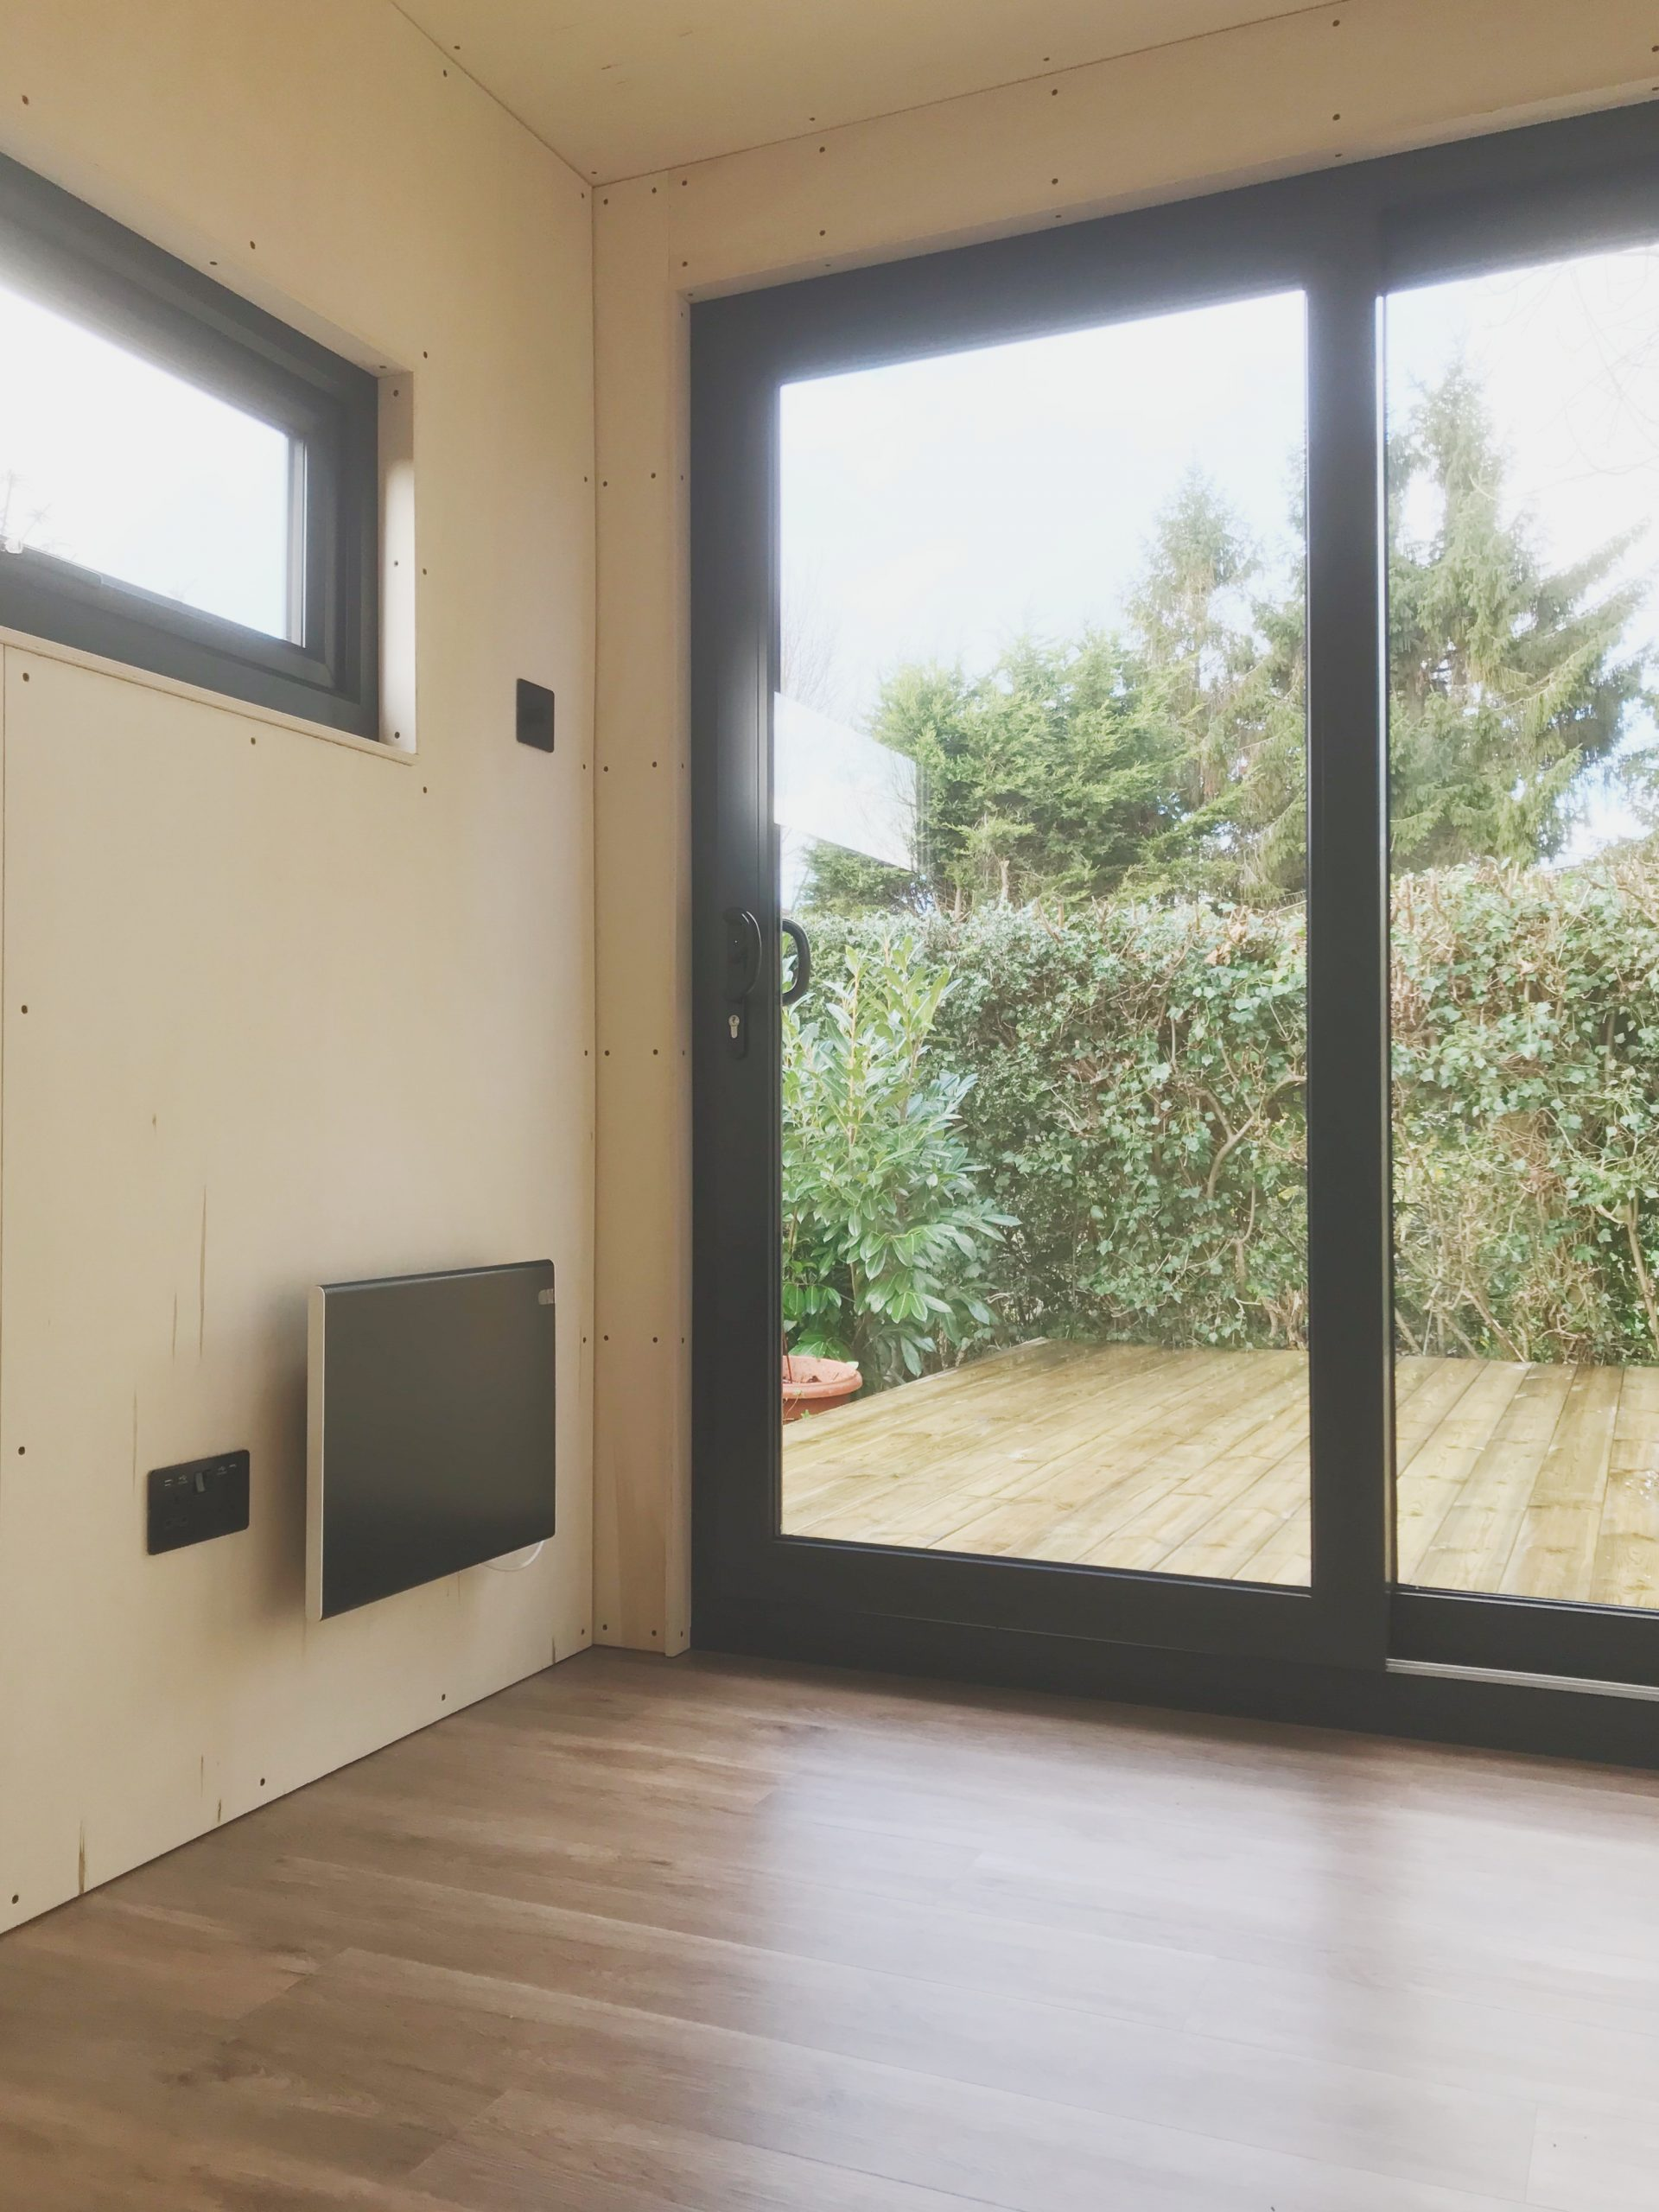 Box Clad Mini Box Poplar Ply Interior Patio Doors